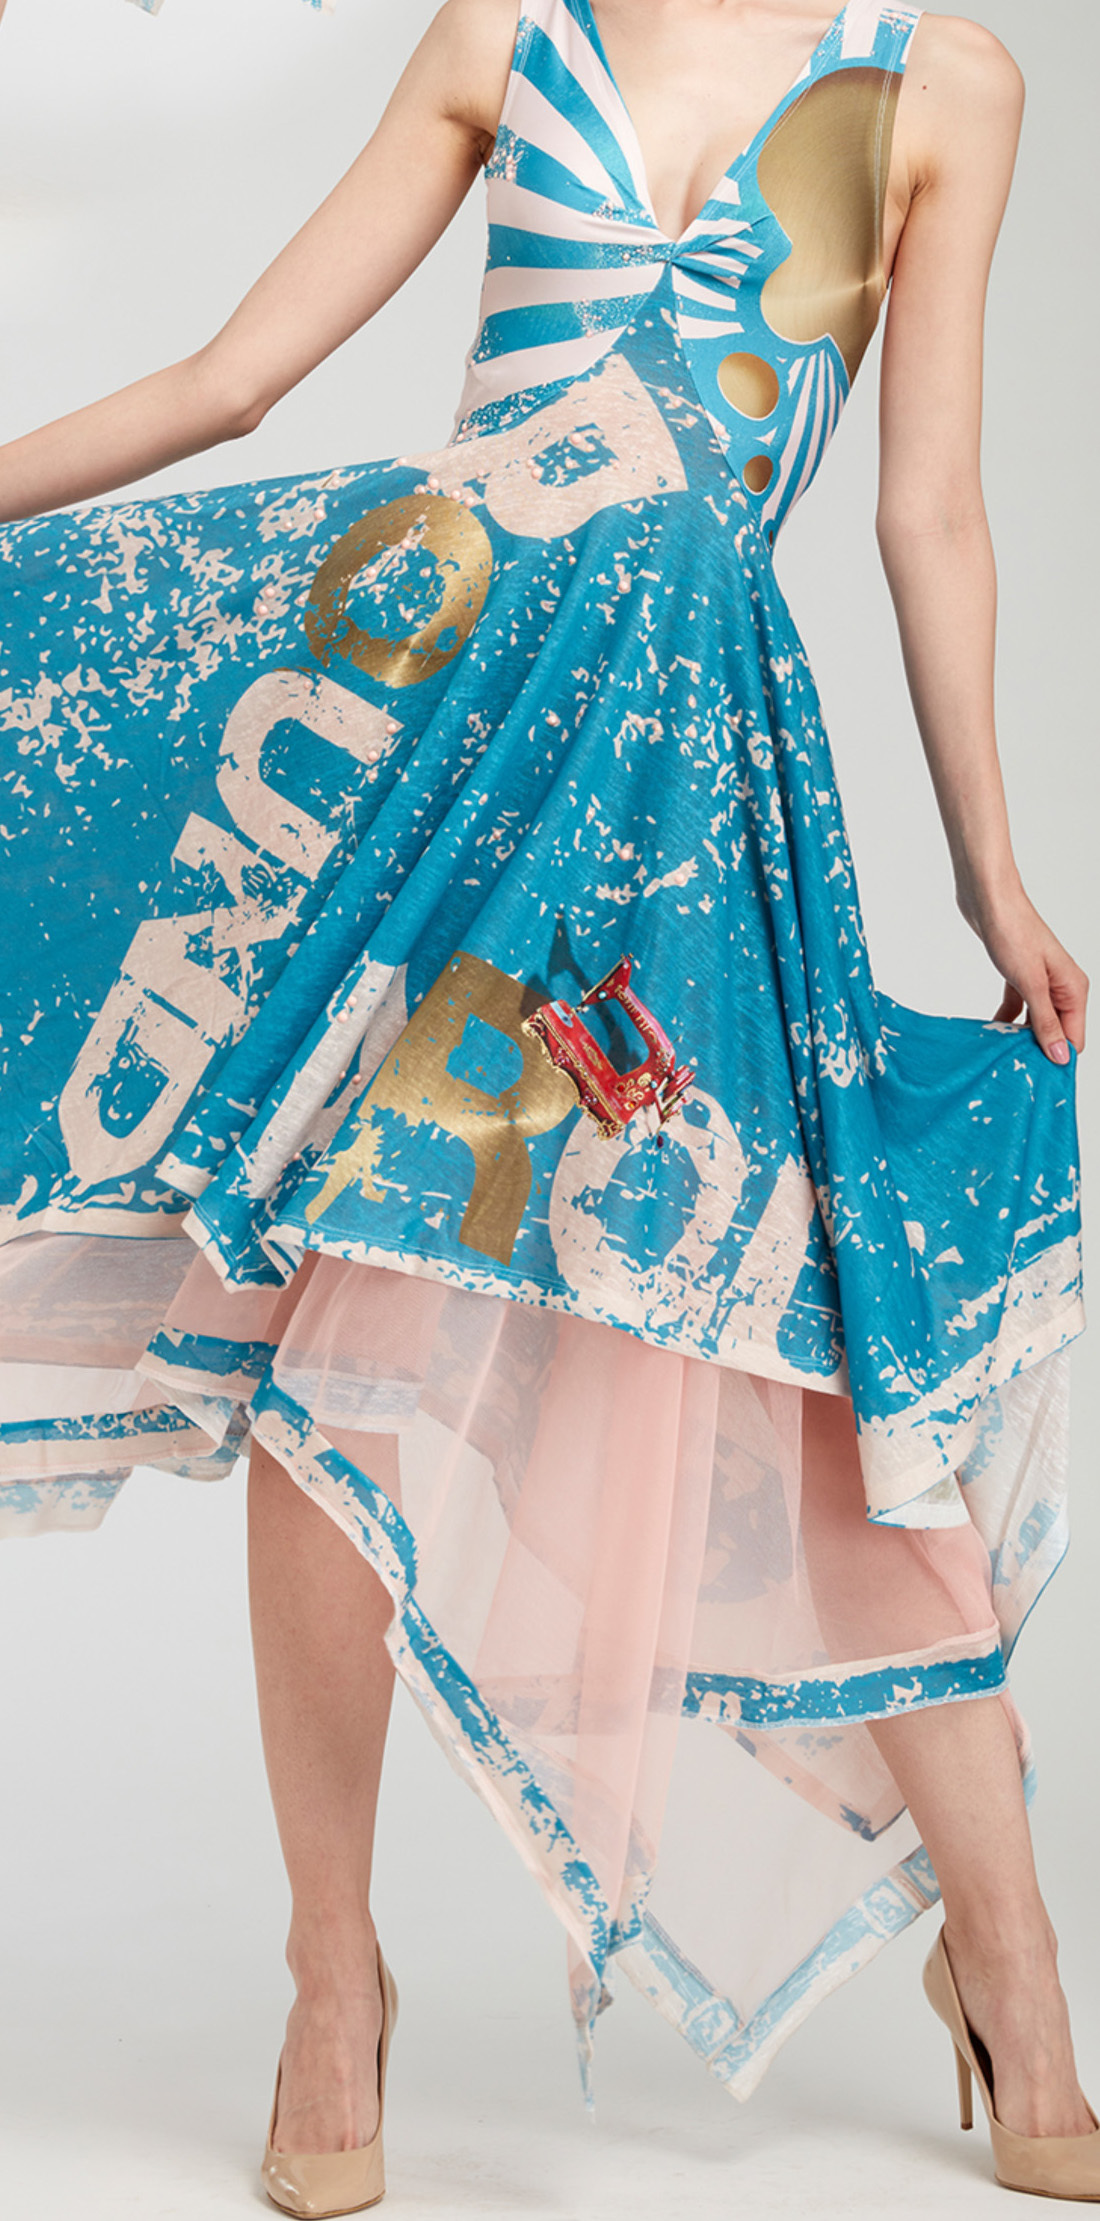 IPNG: Sunny Speach Four Corner Illusion Dress